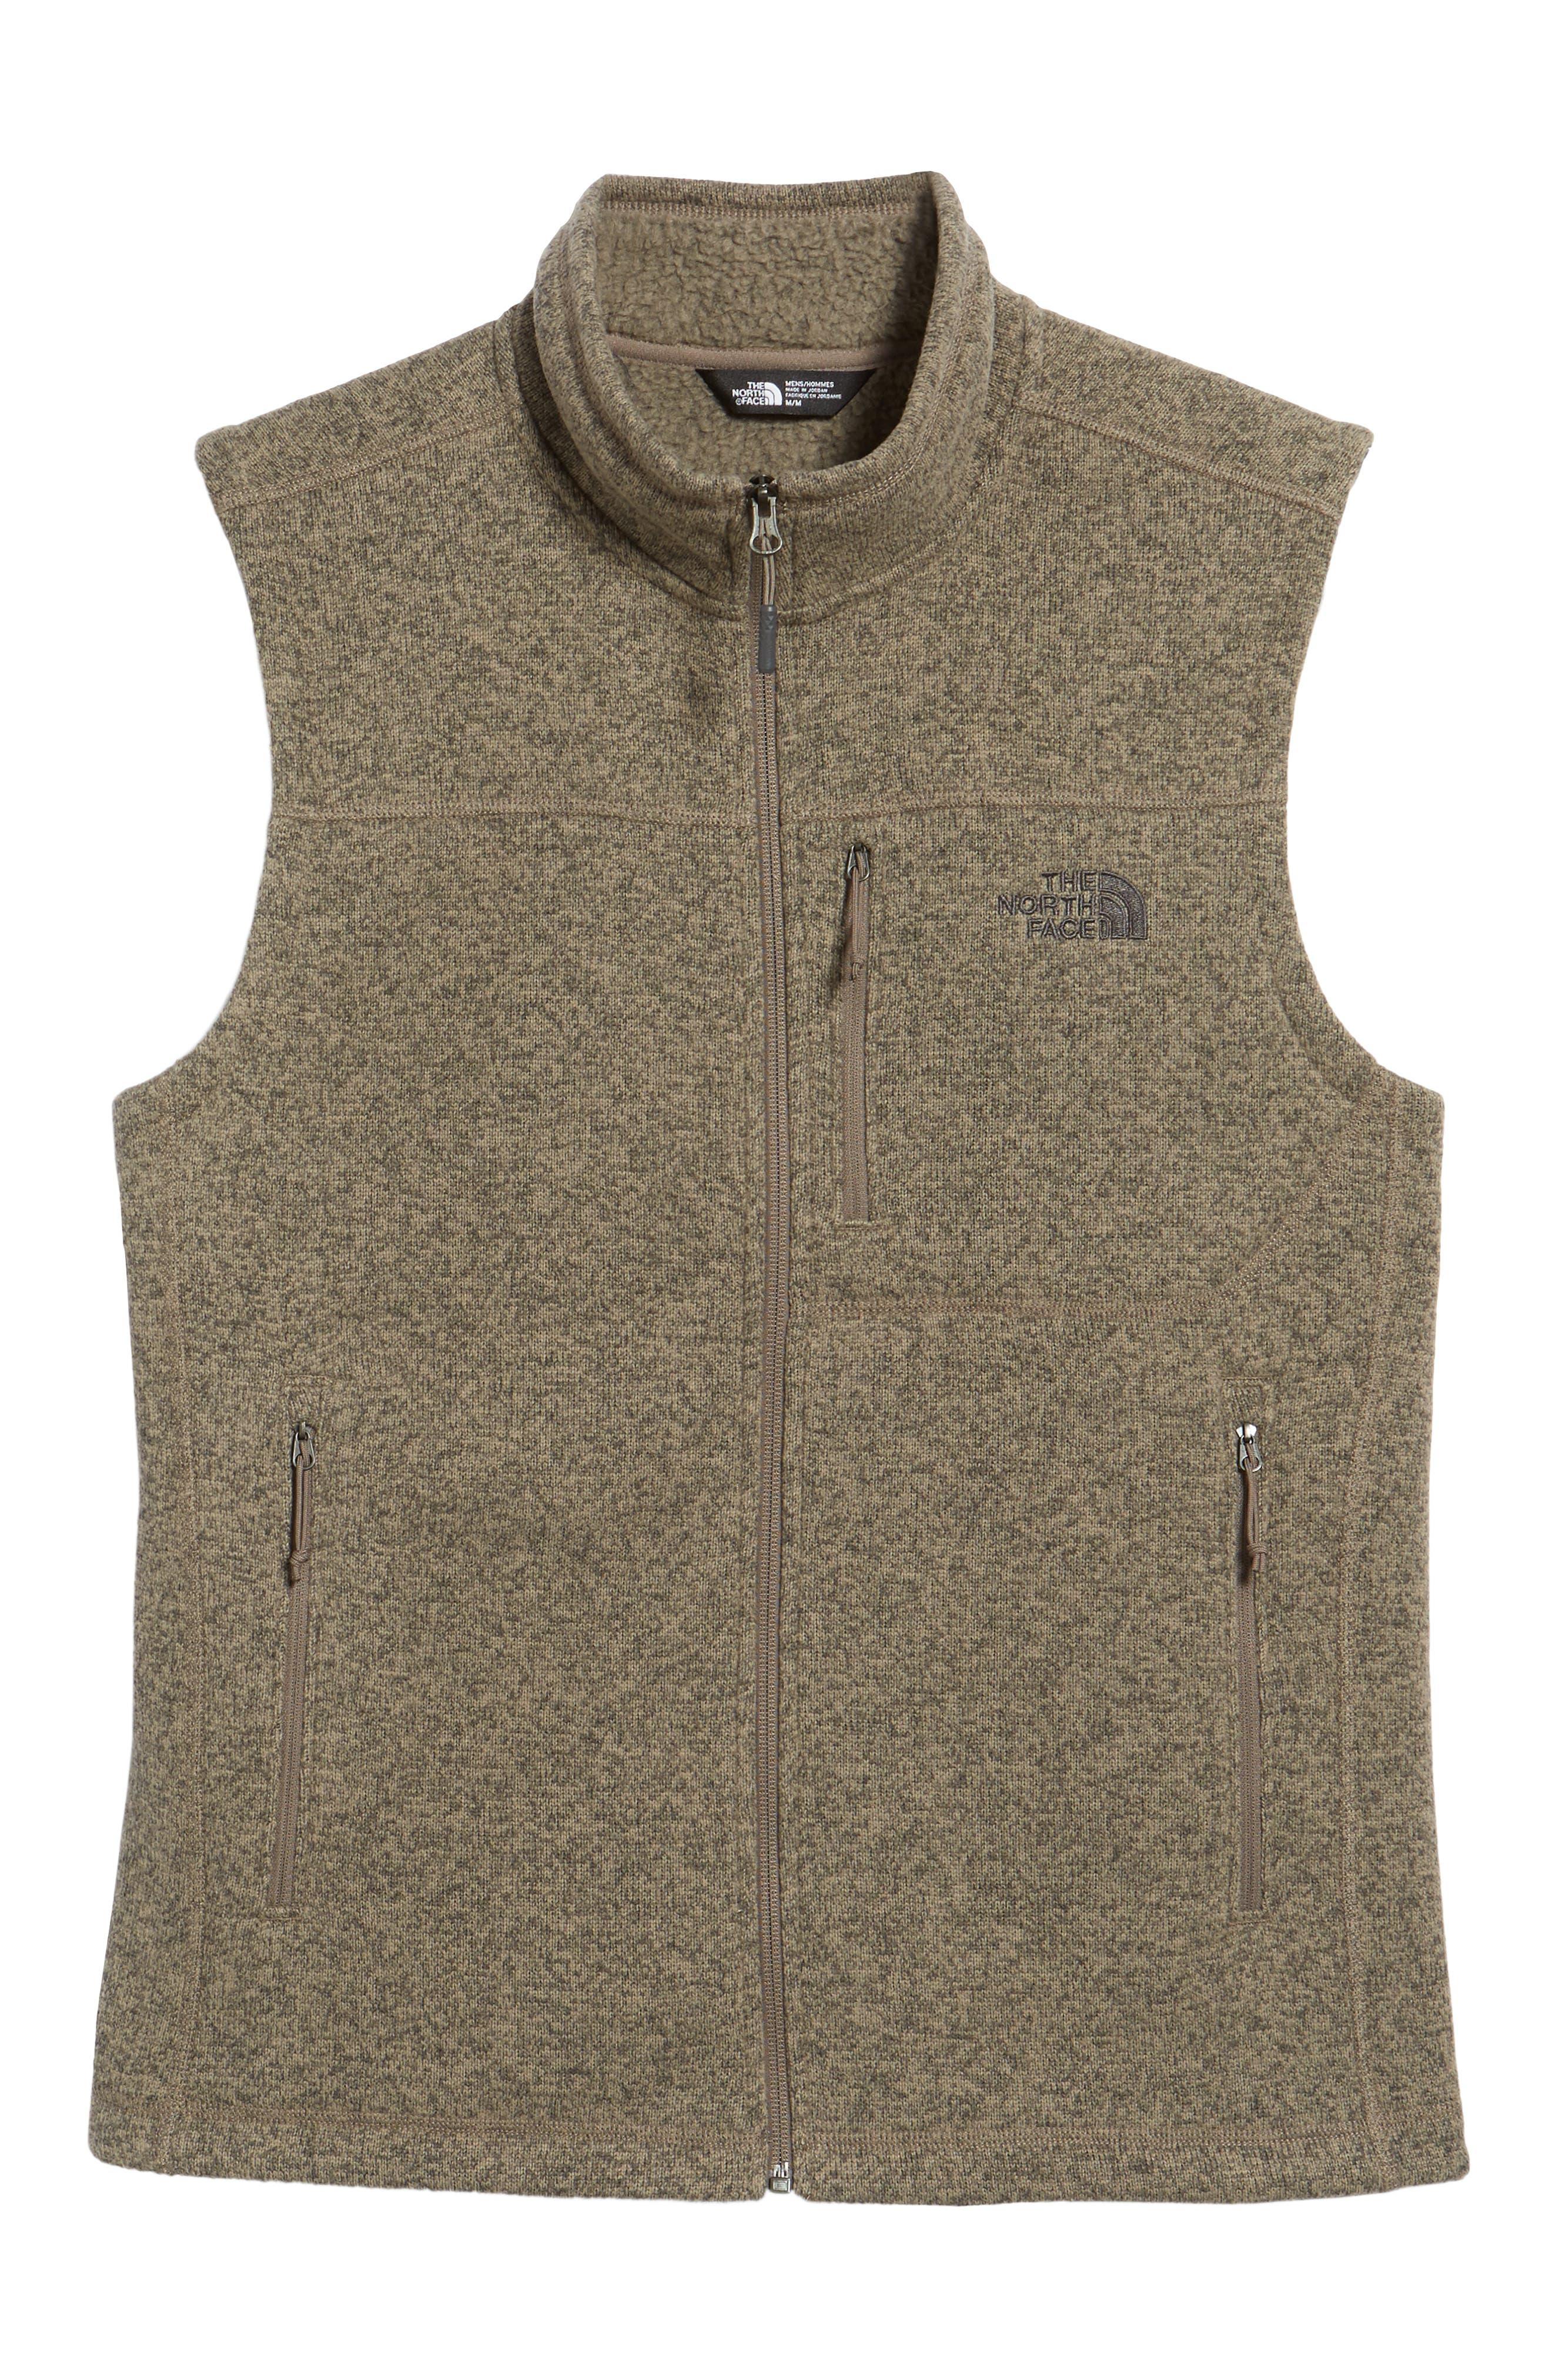 Gordon Lyons Zip Fleece Vest,                             Alternate thumbnail 23, color,